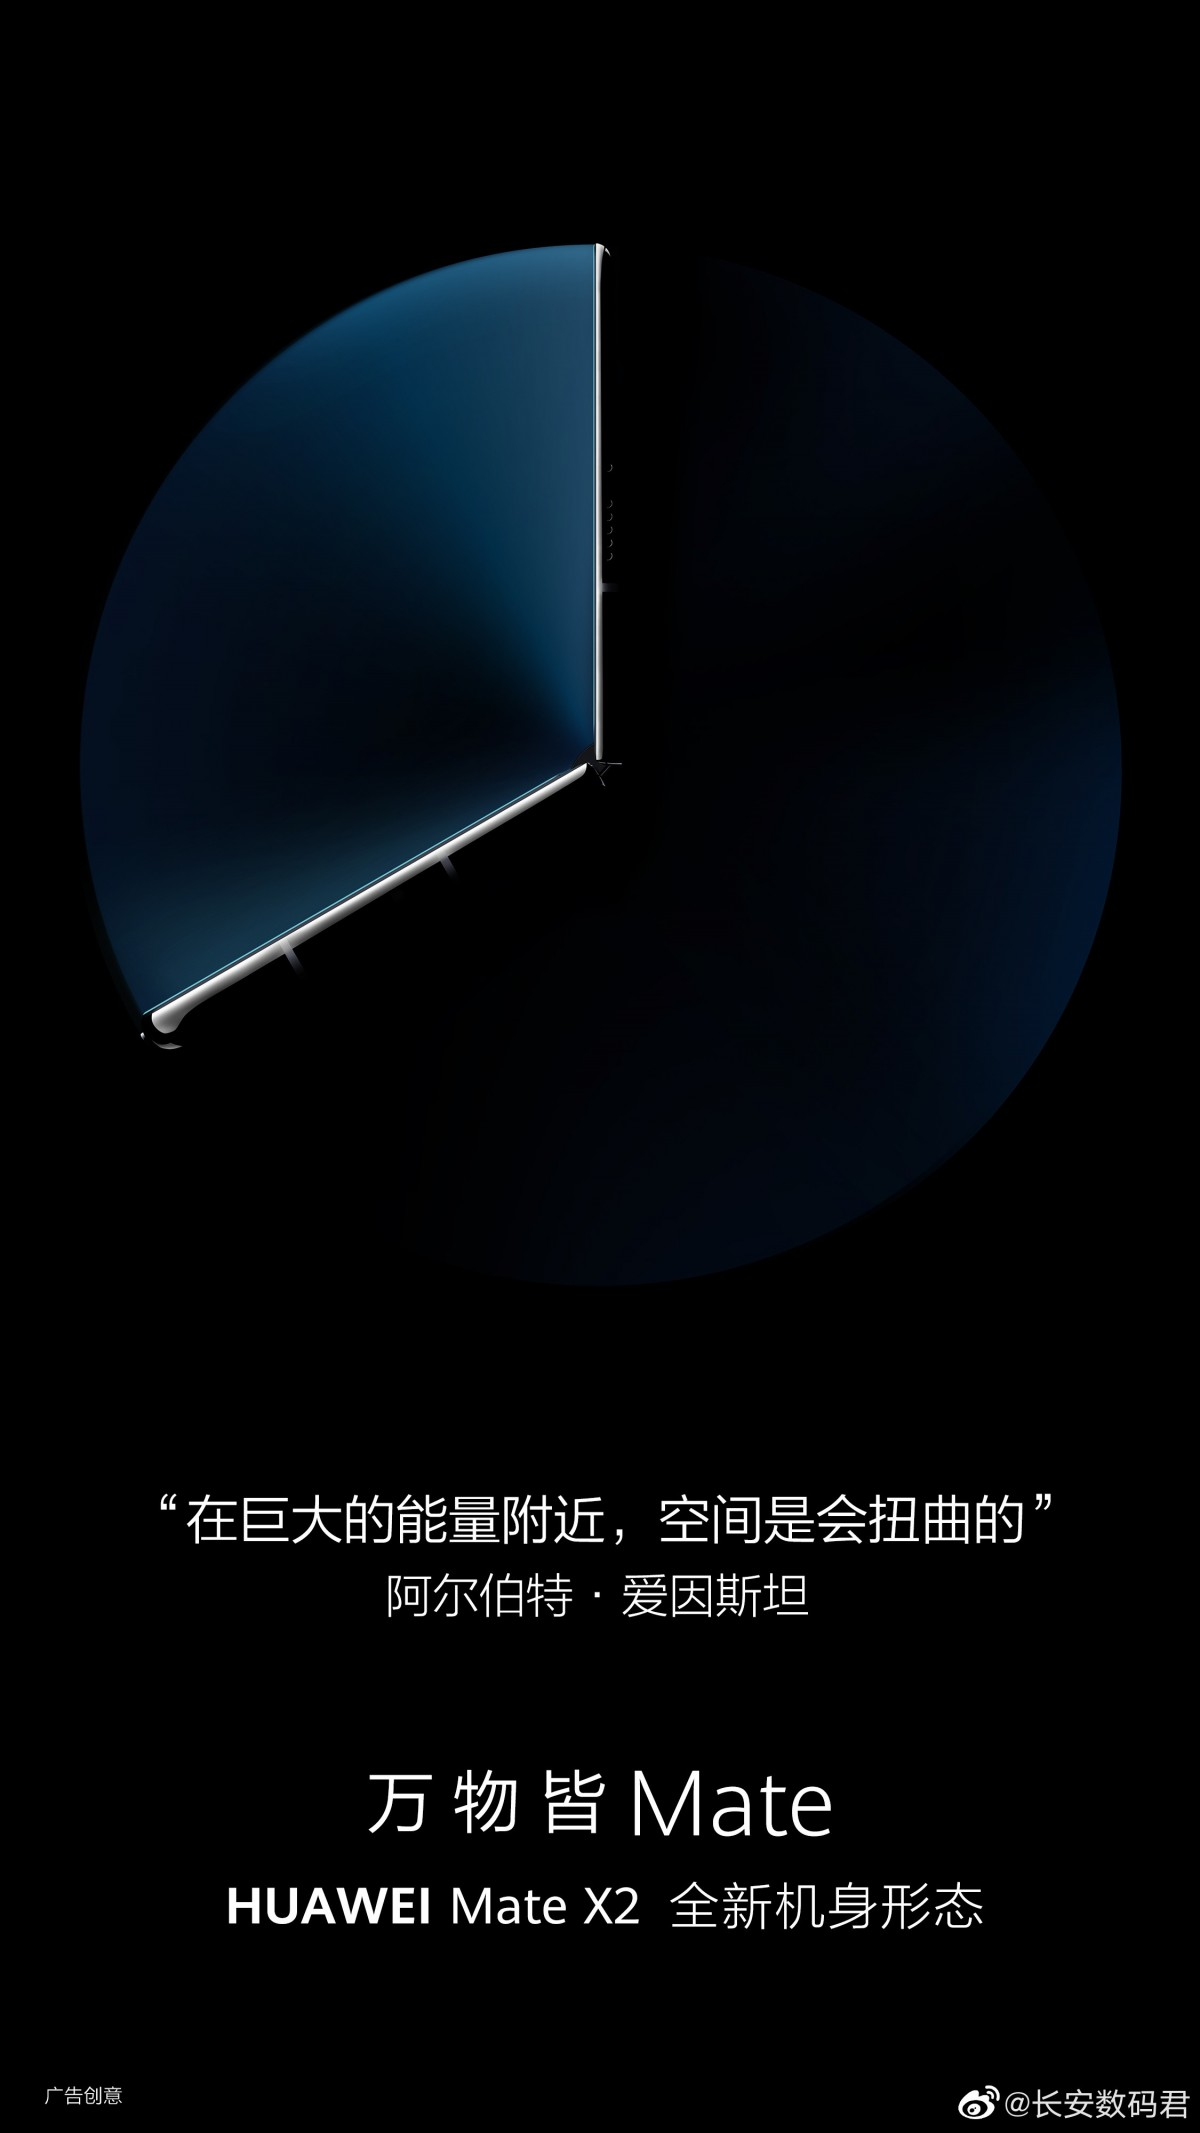 Huawei Mate X2 Samsung